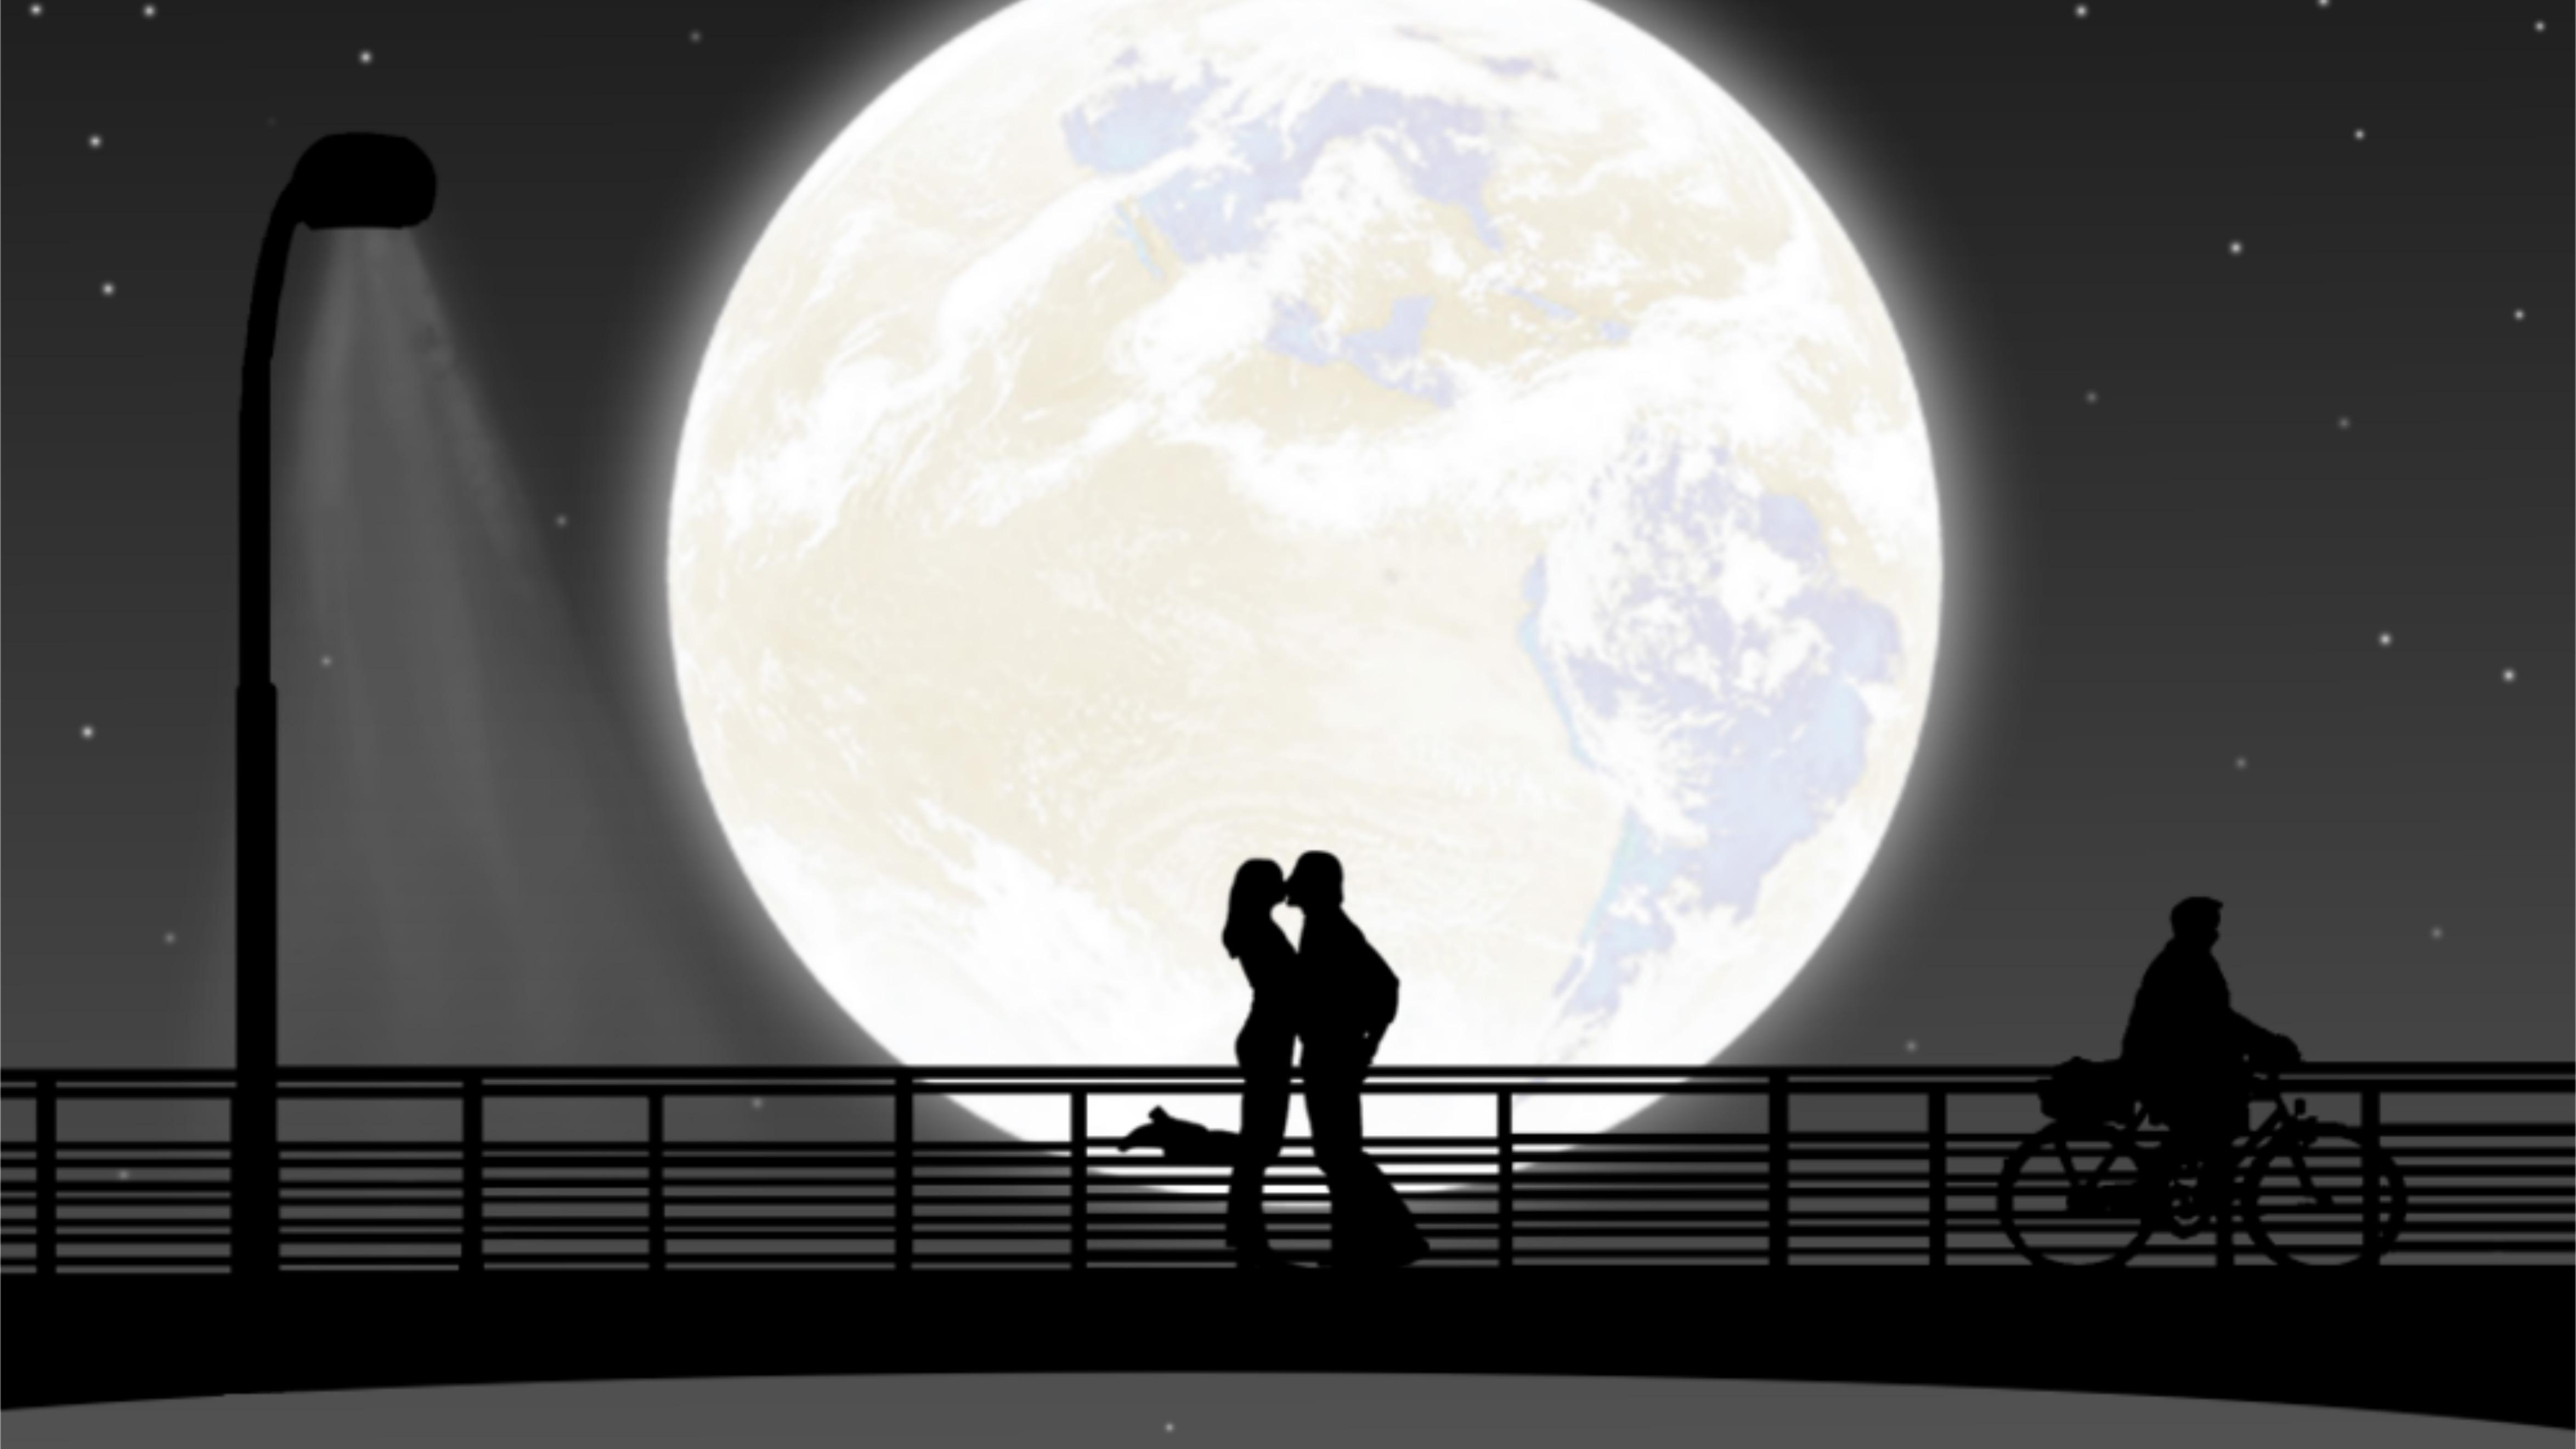 3840x2160 full moon night couple kiss 4k hd 4k wallpapers - 4k kiss wallpaper ...